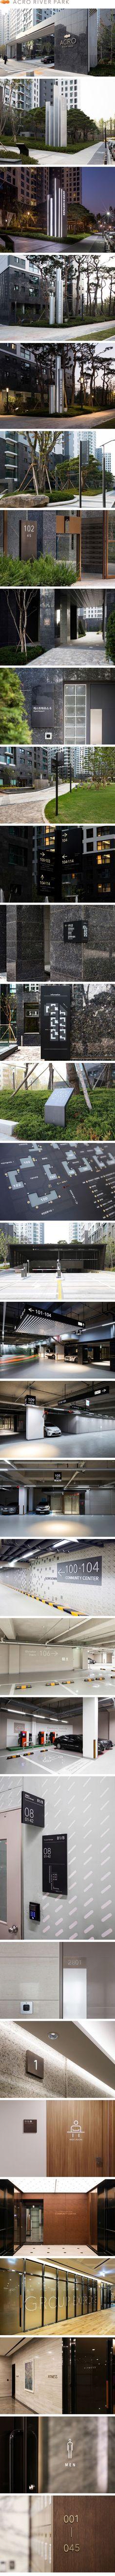 ACRO RIVER PARK Signage DAELIM Apartment Gate Pole Client : DAELIM 2017 #아뜰리에동가 #동가 #sign #signage #안내판 #사이니지 #사인 #공간디자인 #브랜딩 #브랜드디자인 #아이덴티티 #타이포그라피 #그래픽디자인 #그래픽 Entrance Signage, Park Signage, Outdoor Signage, Exterior Signage, Metal Signage, Main Gate Design, Entrance Design, Environmental Graphic Design, Environmental Graphics